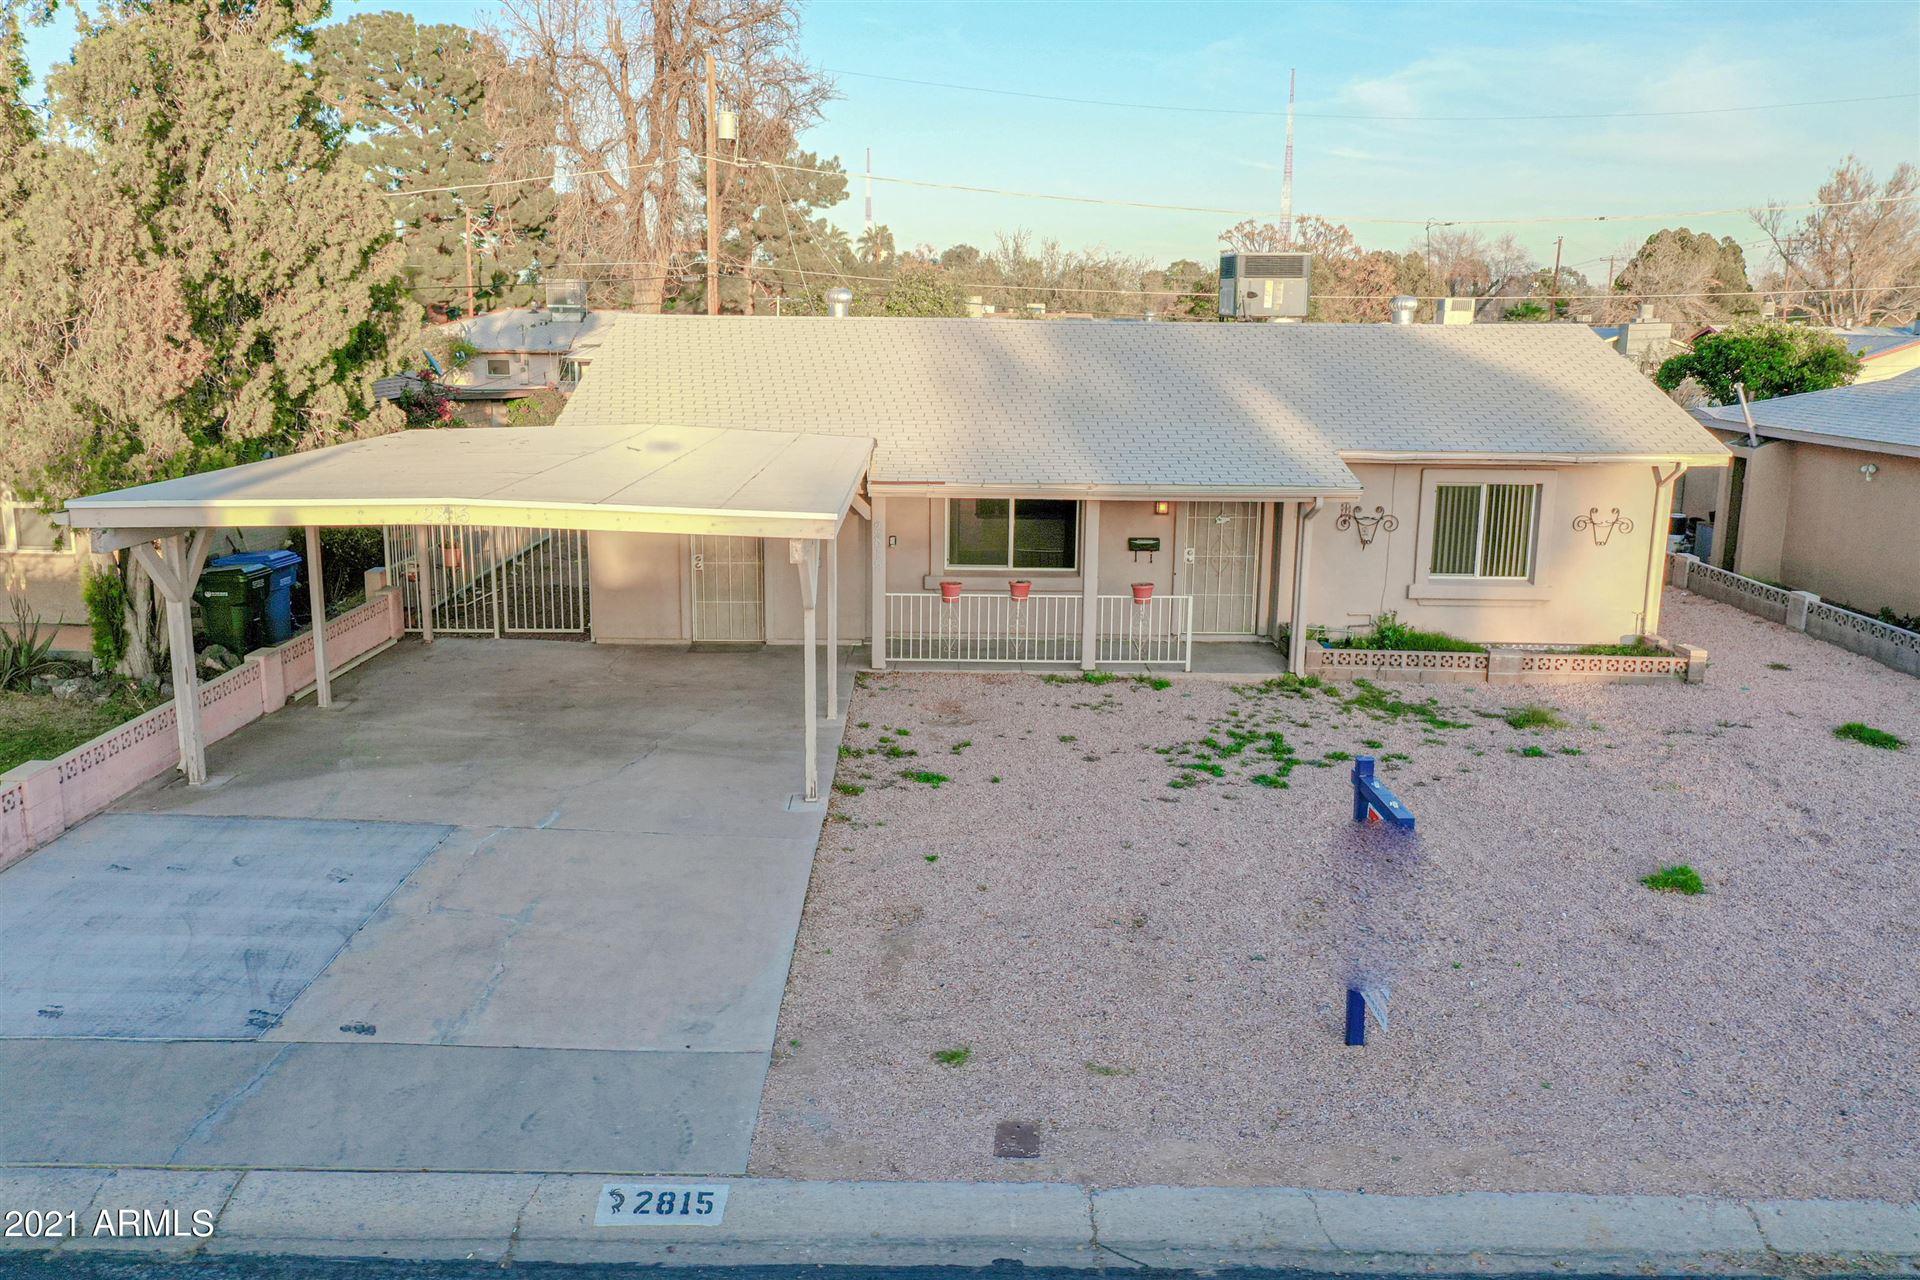 Photo of 2815 N 32ND Place, Phoenix, AZ 85008 (MLS # 6202735)